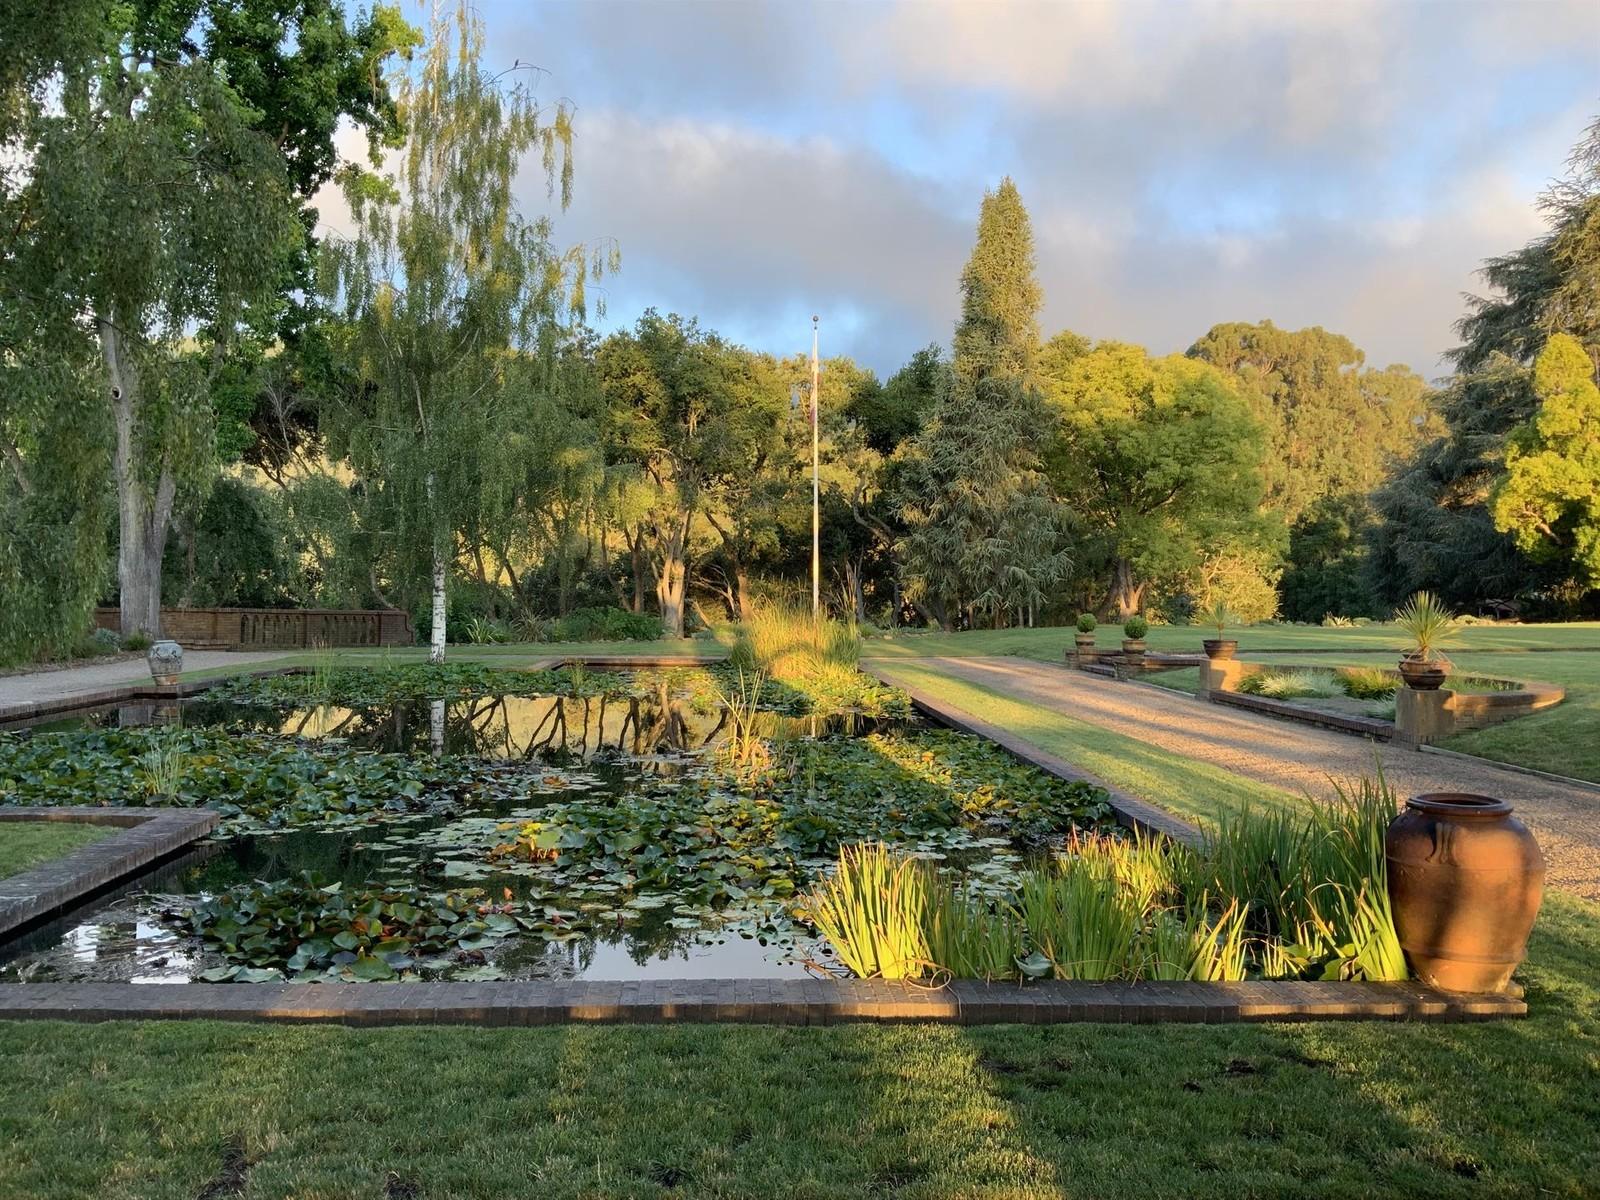 House for sale in Woodside California, mls, property for sale, real estate, Ahava Jerusalem, pond, garden, luxury, beautiful scenery